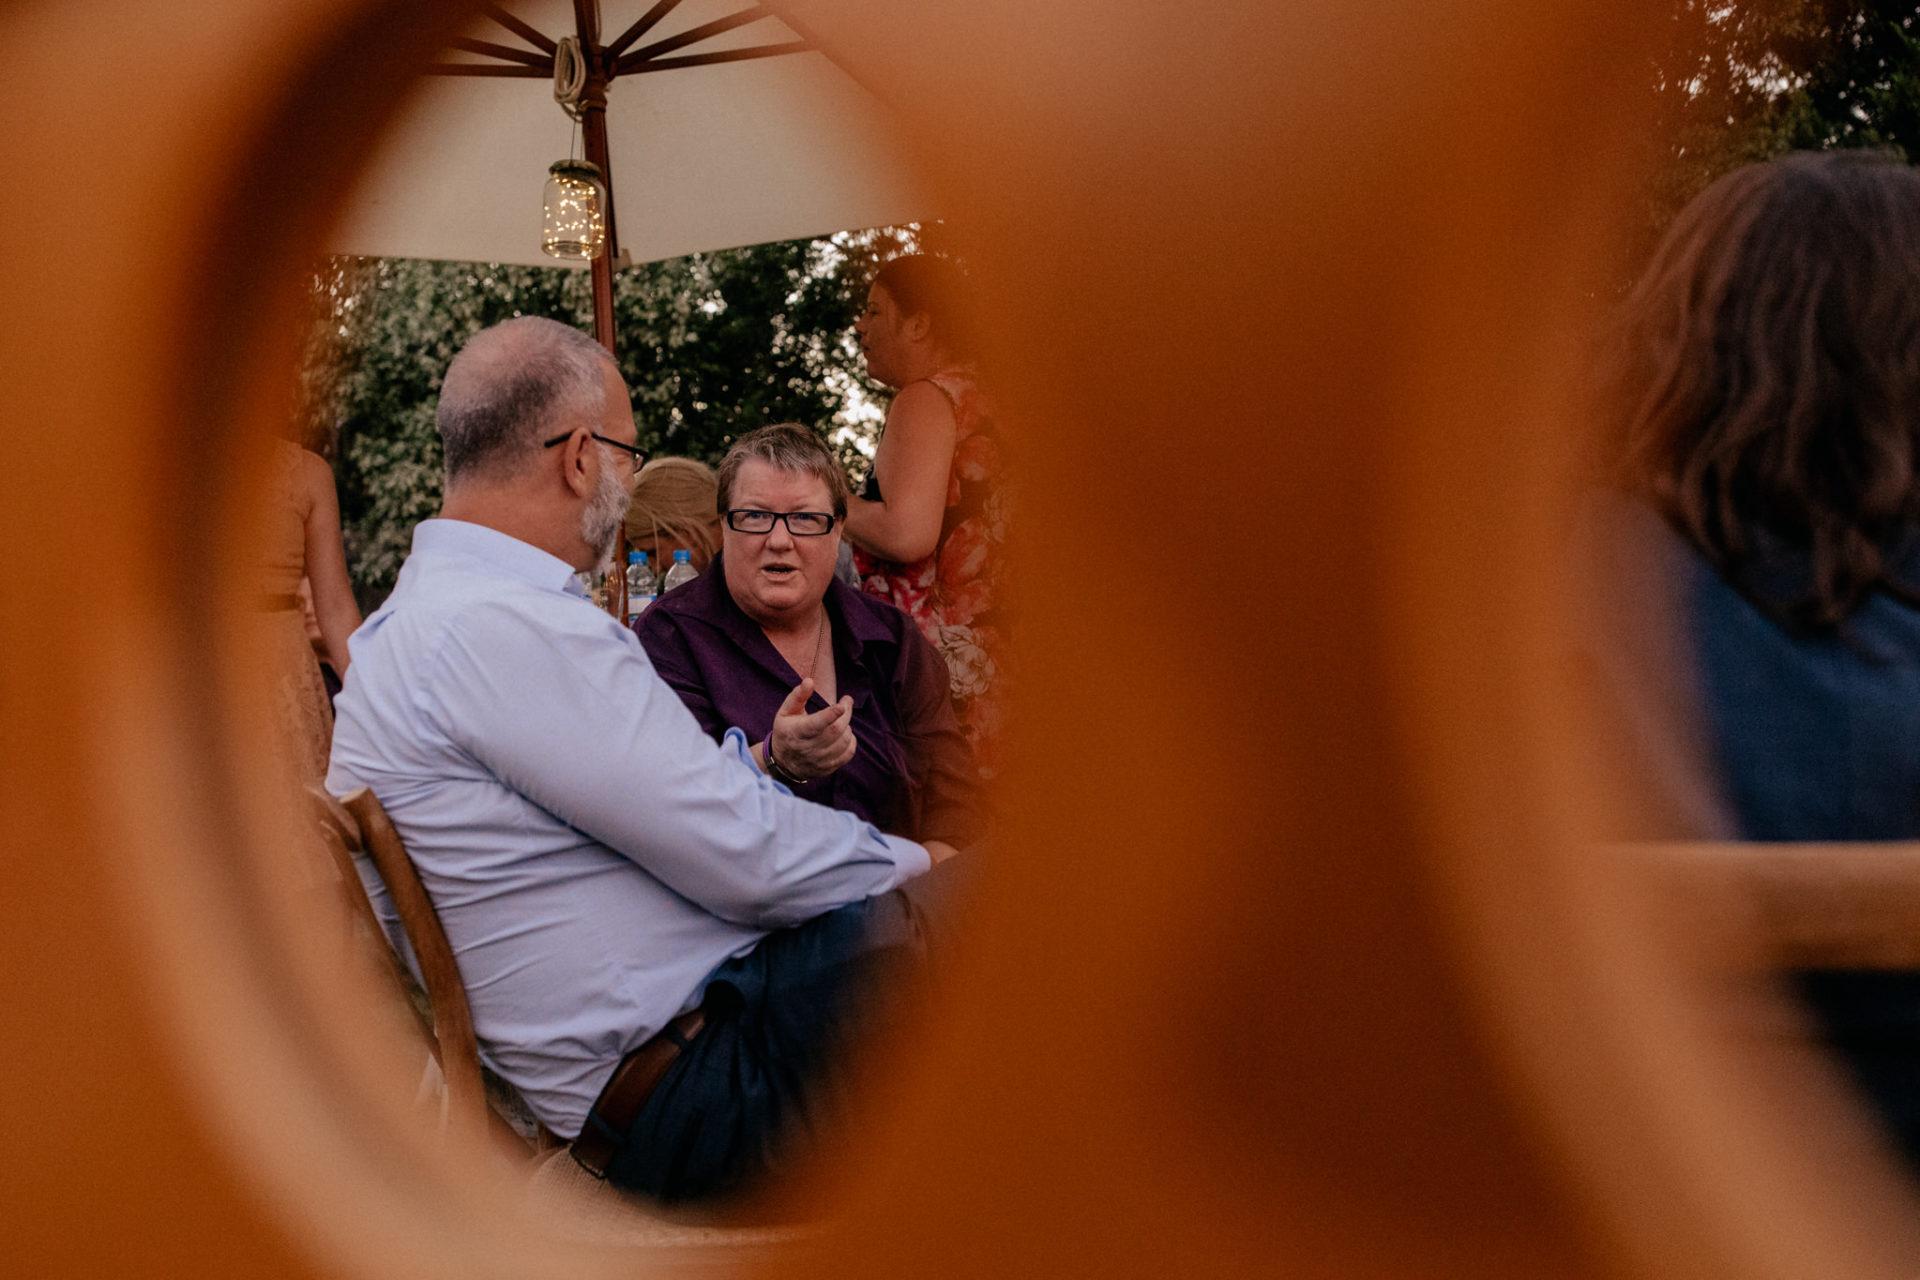 backyard wedding melbourne-trend 2019-garden wedding at home-giant games-wedding guest